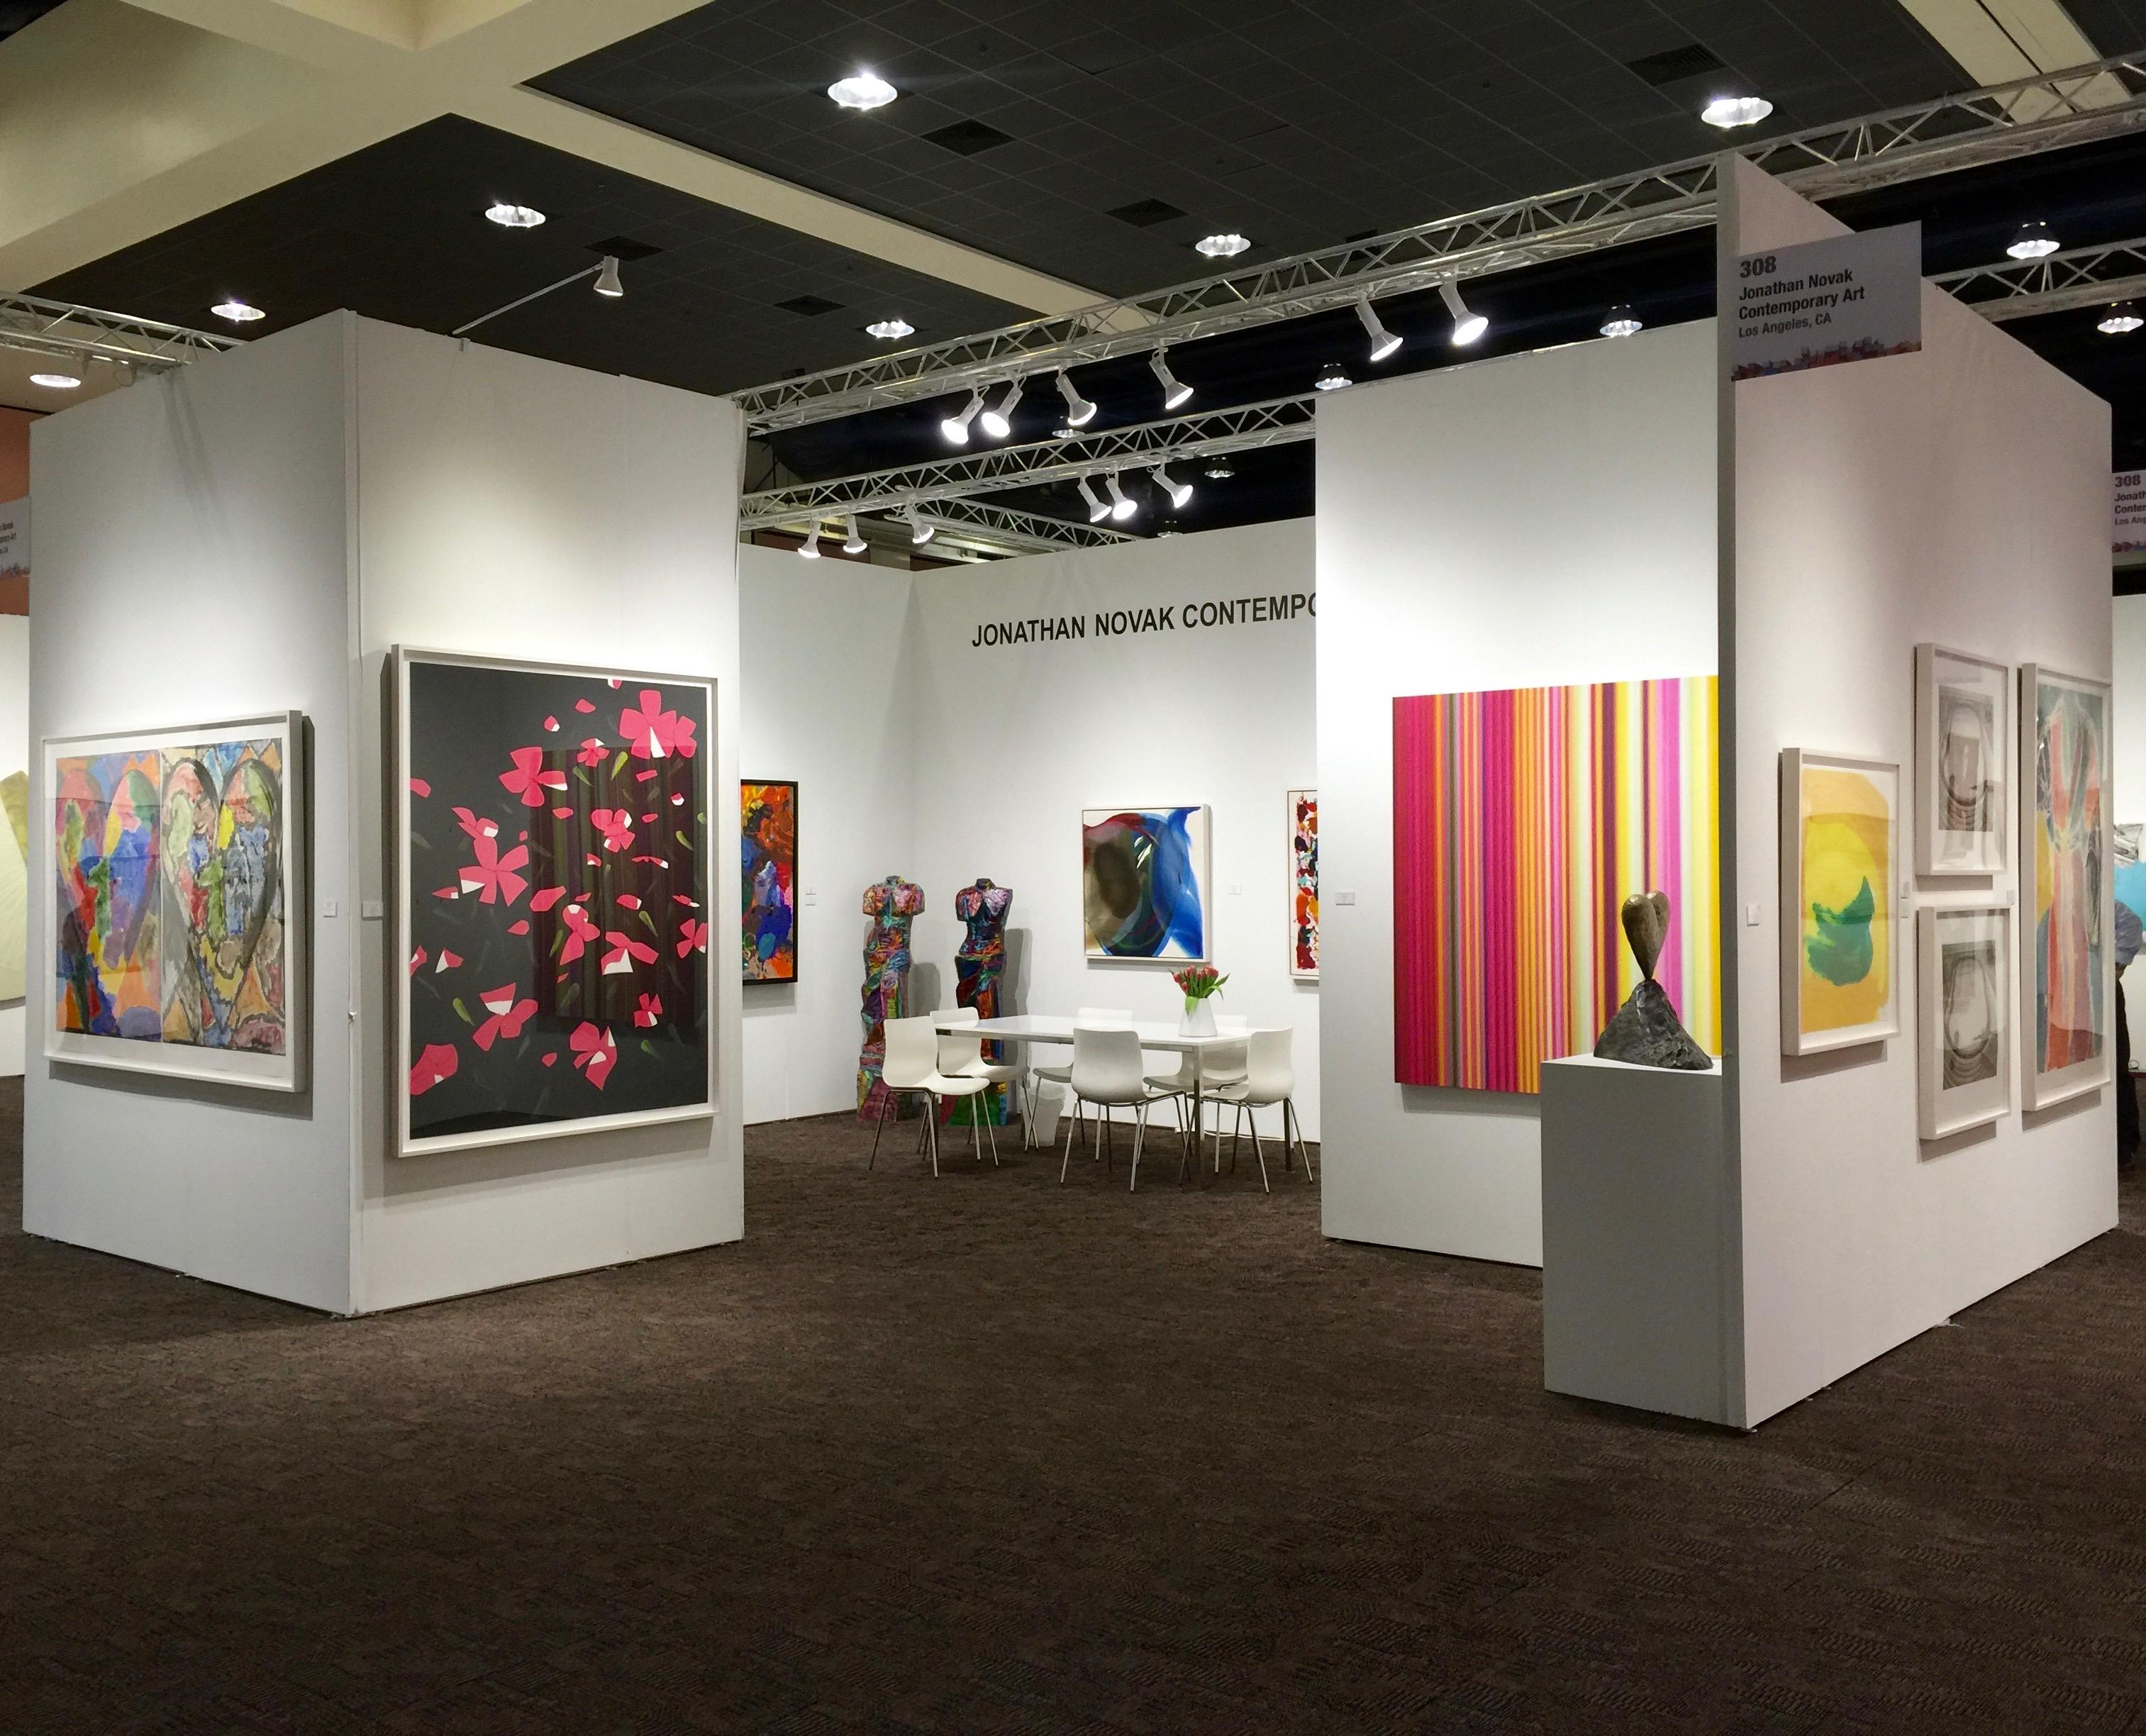 Palm springs fine art fair jonathan novak contemporary art for Palm springs craft fair